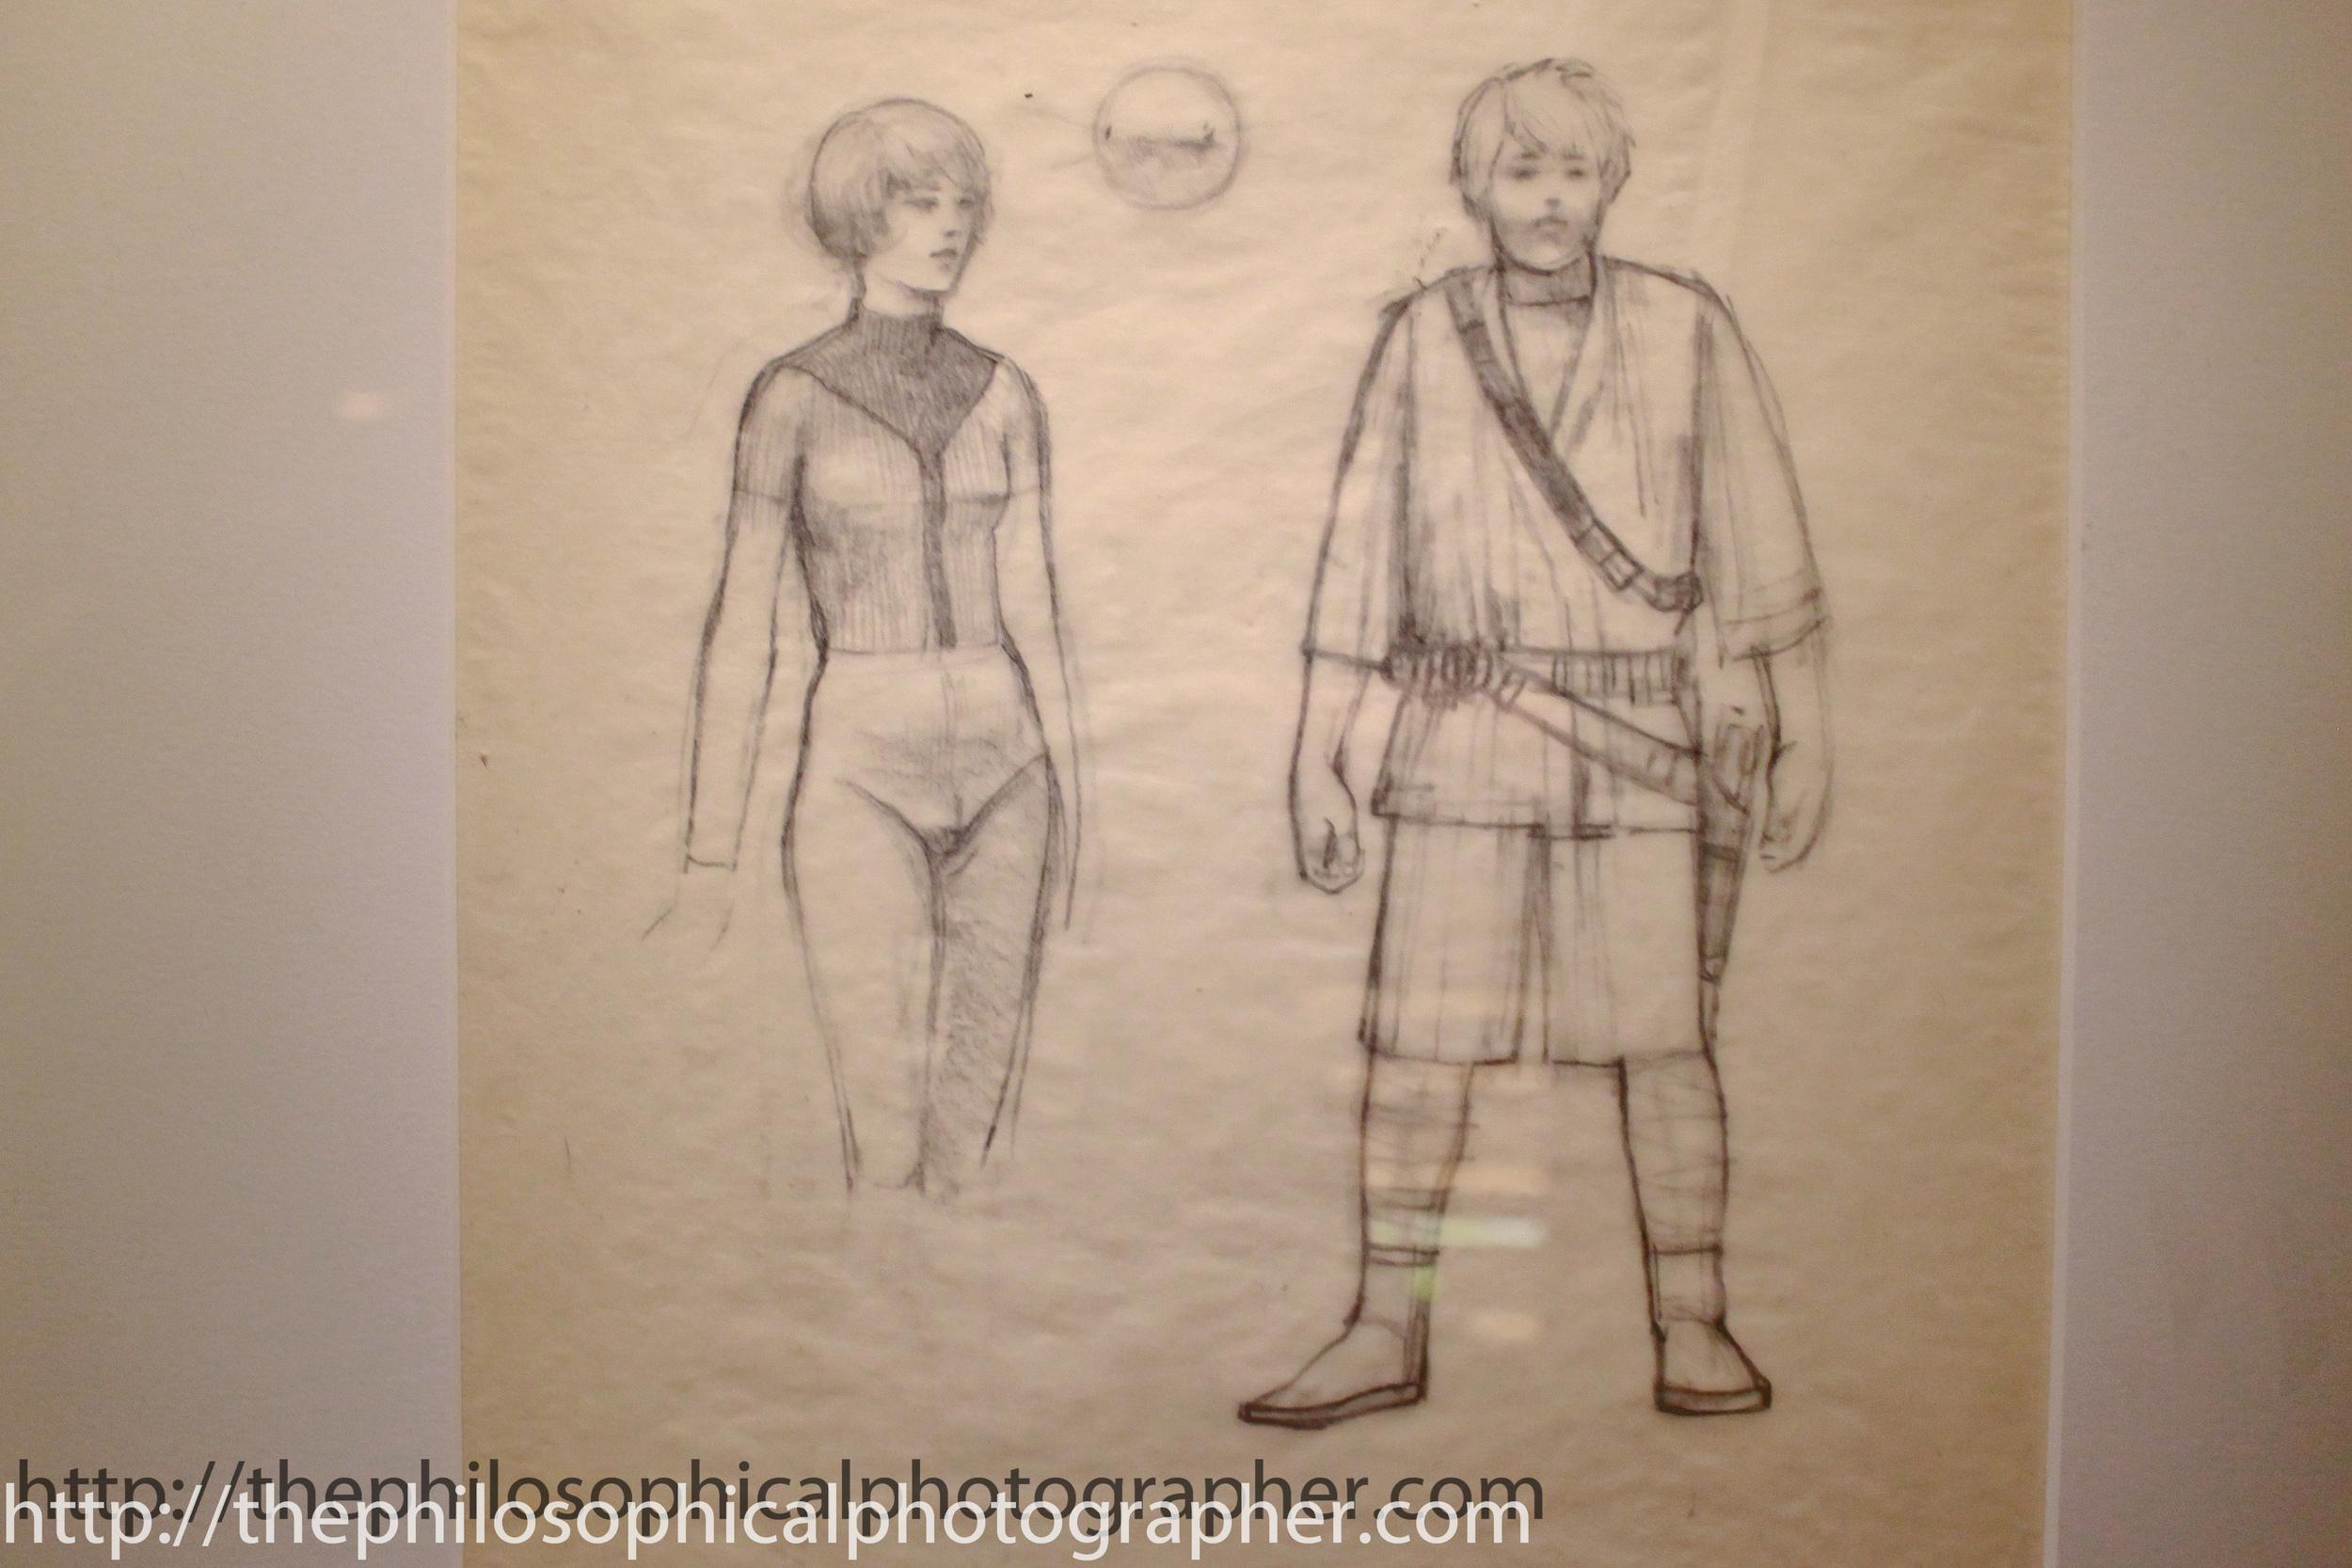 Early Luke and Leia